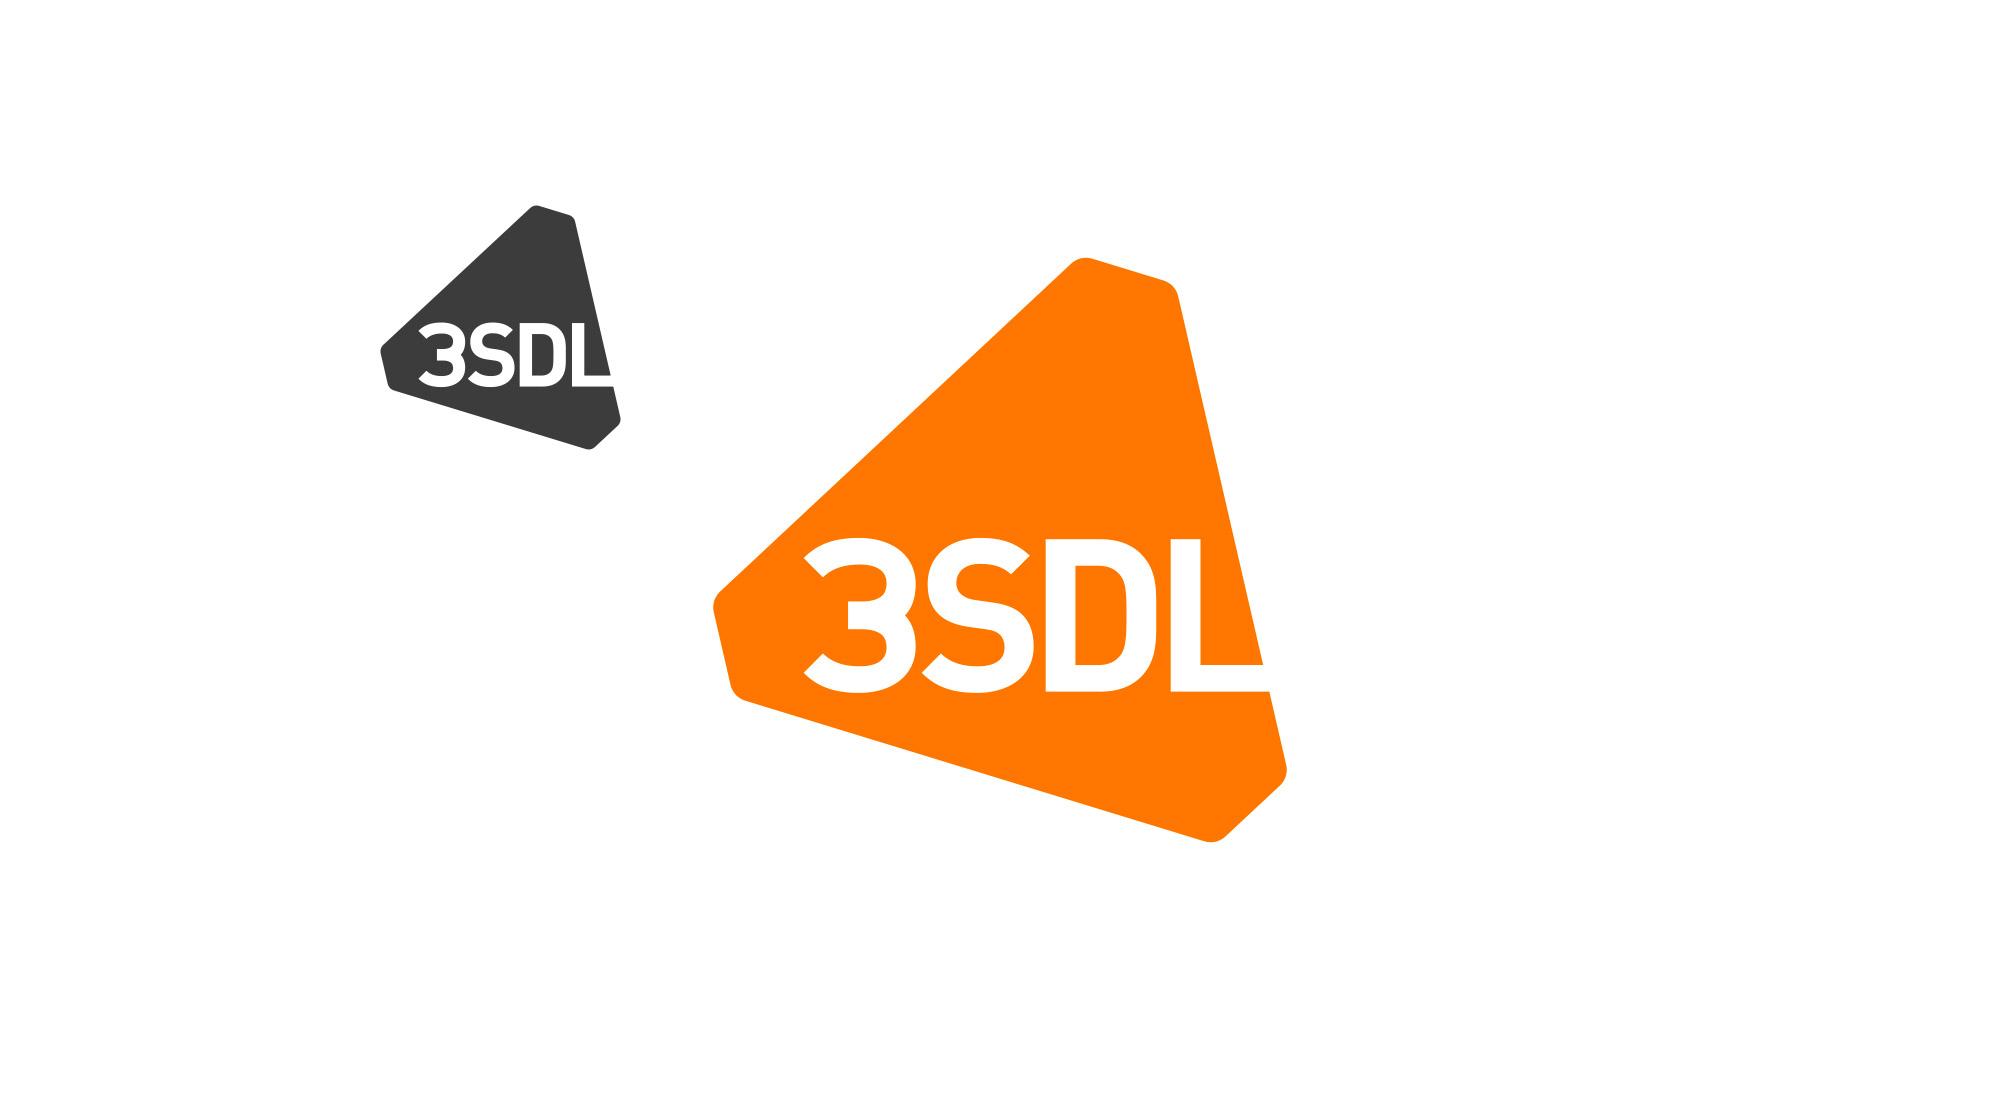 3sdl main logo and monotone logo